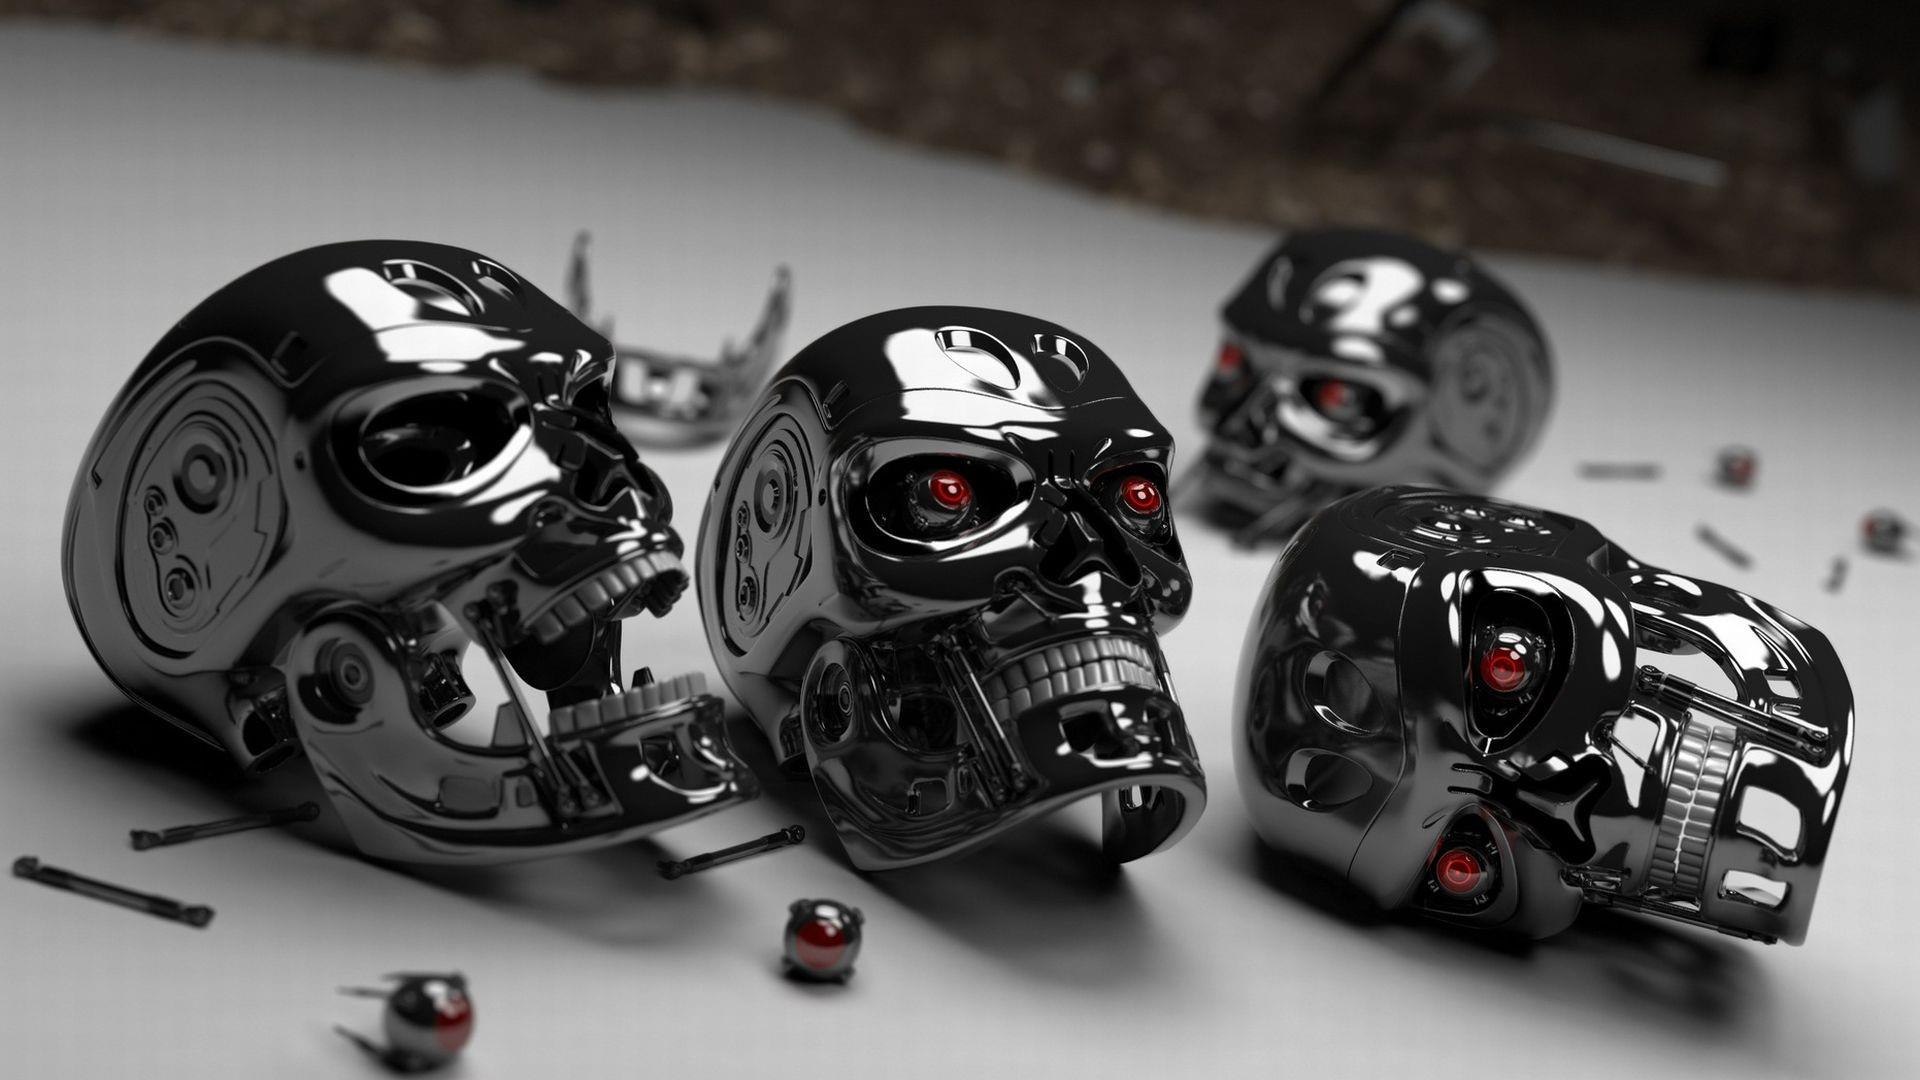 Skulls Terminator